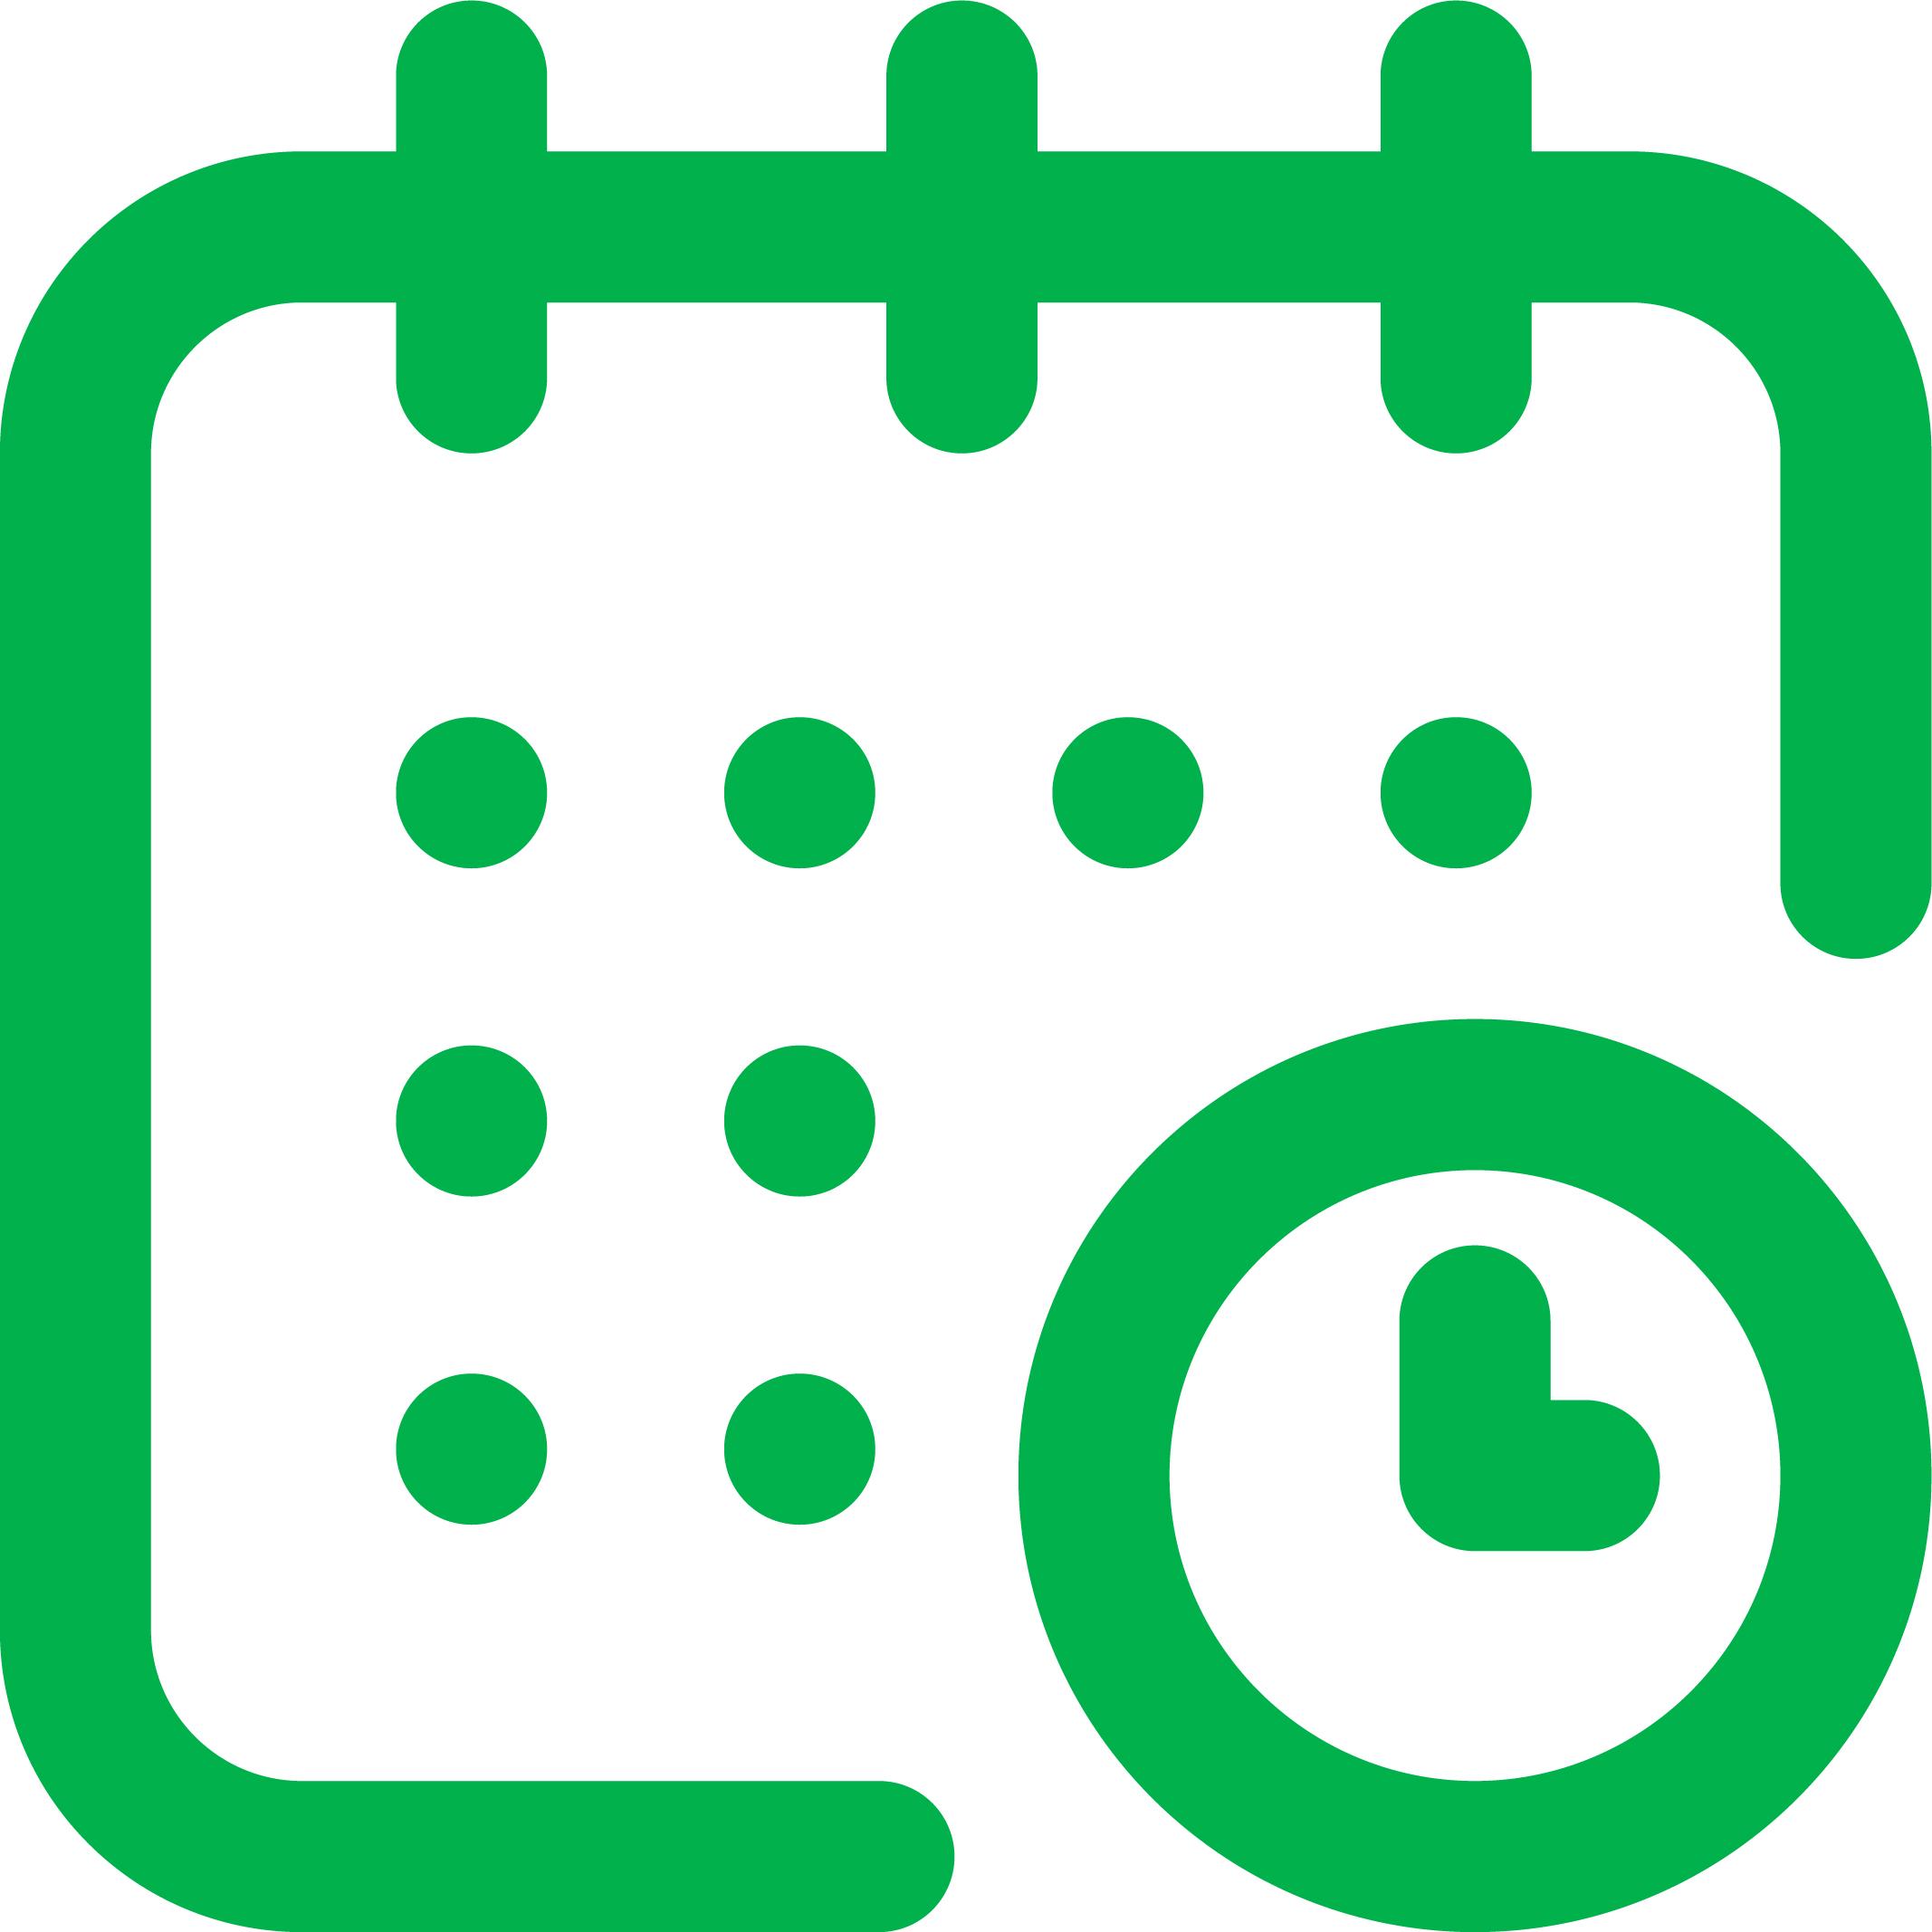 3dta_calendar-01.jpg